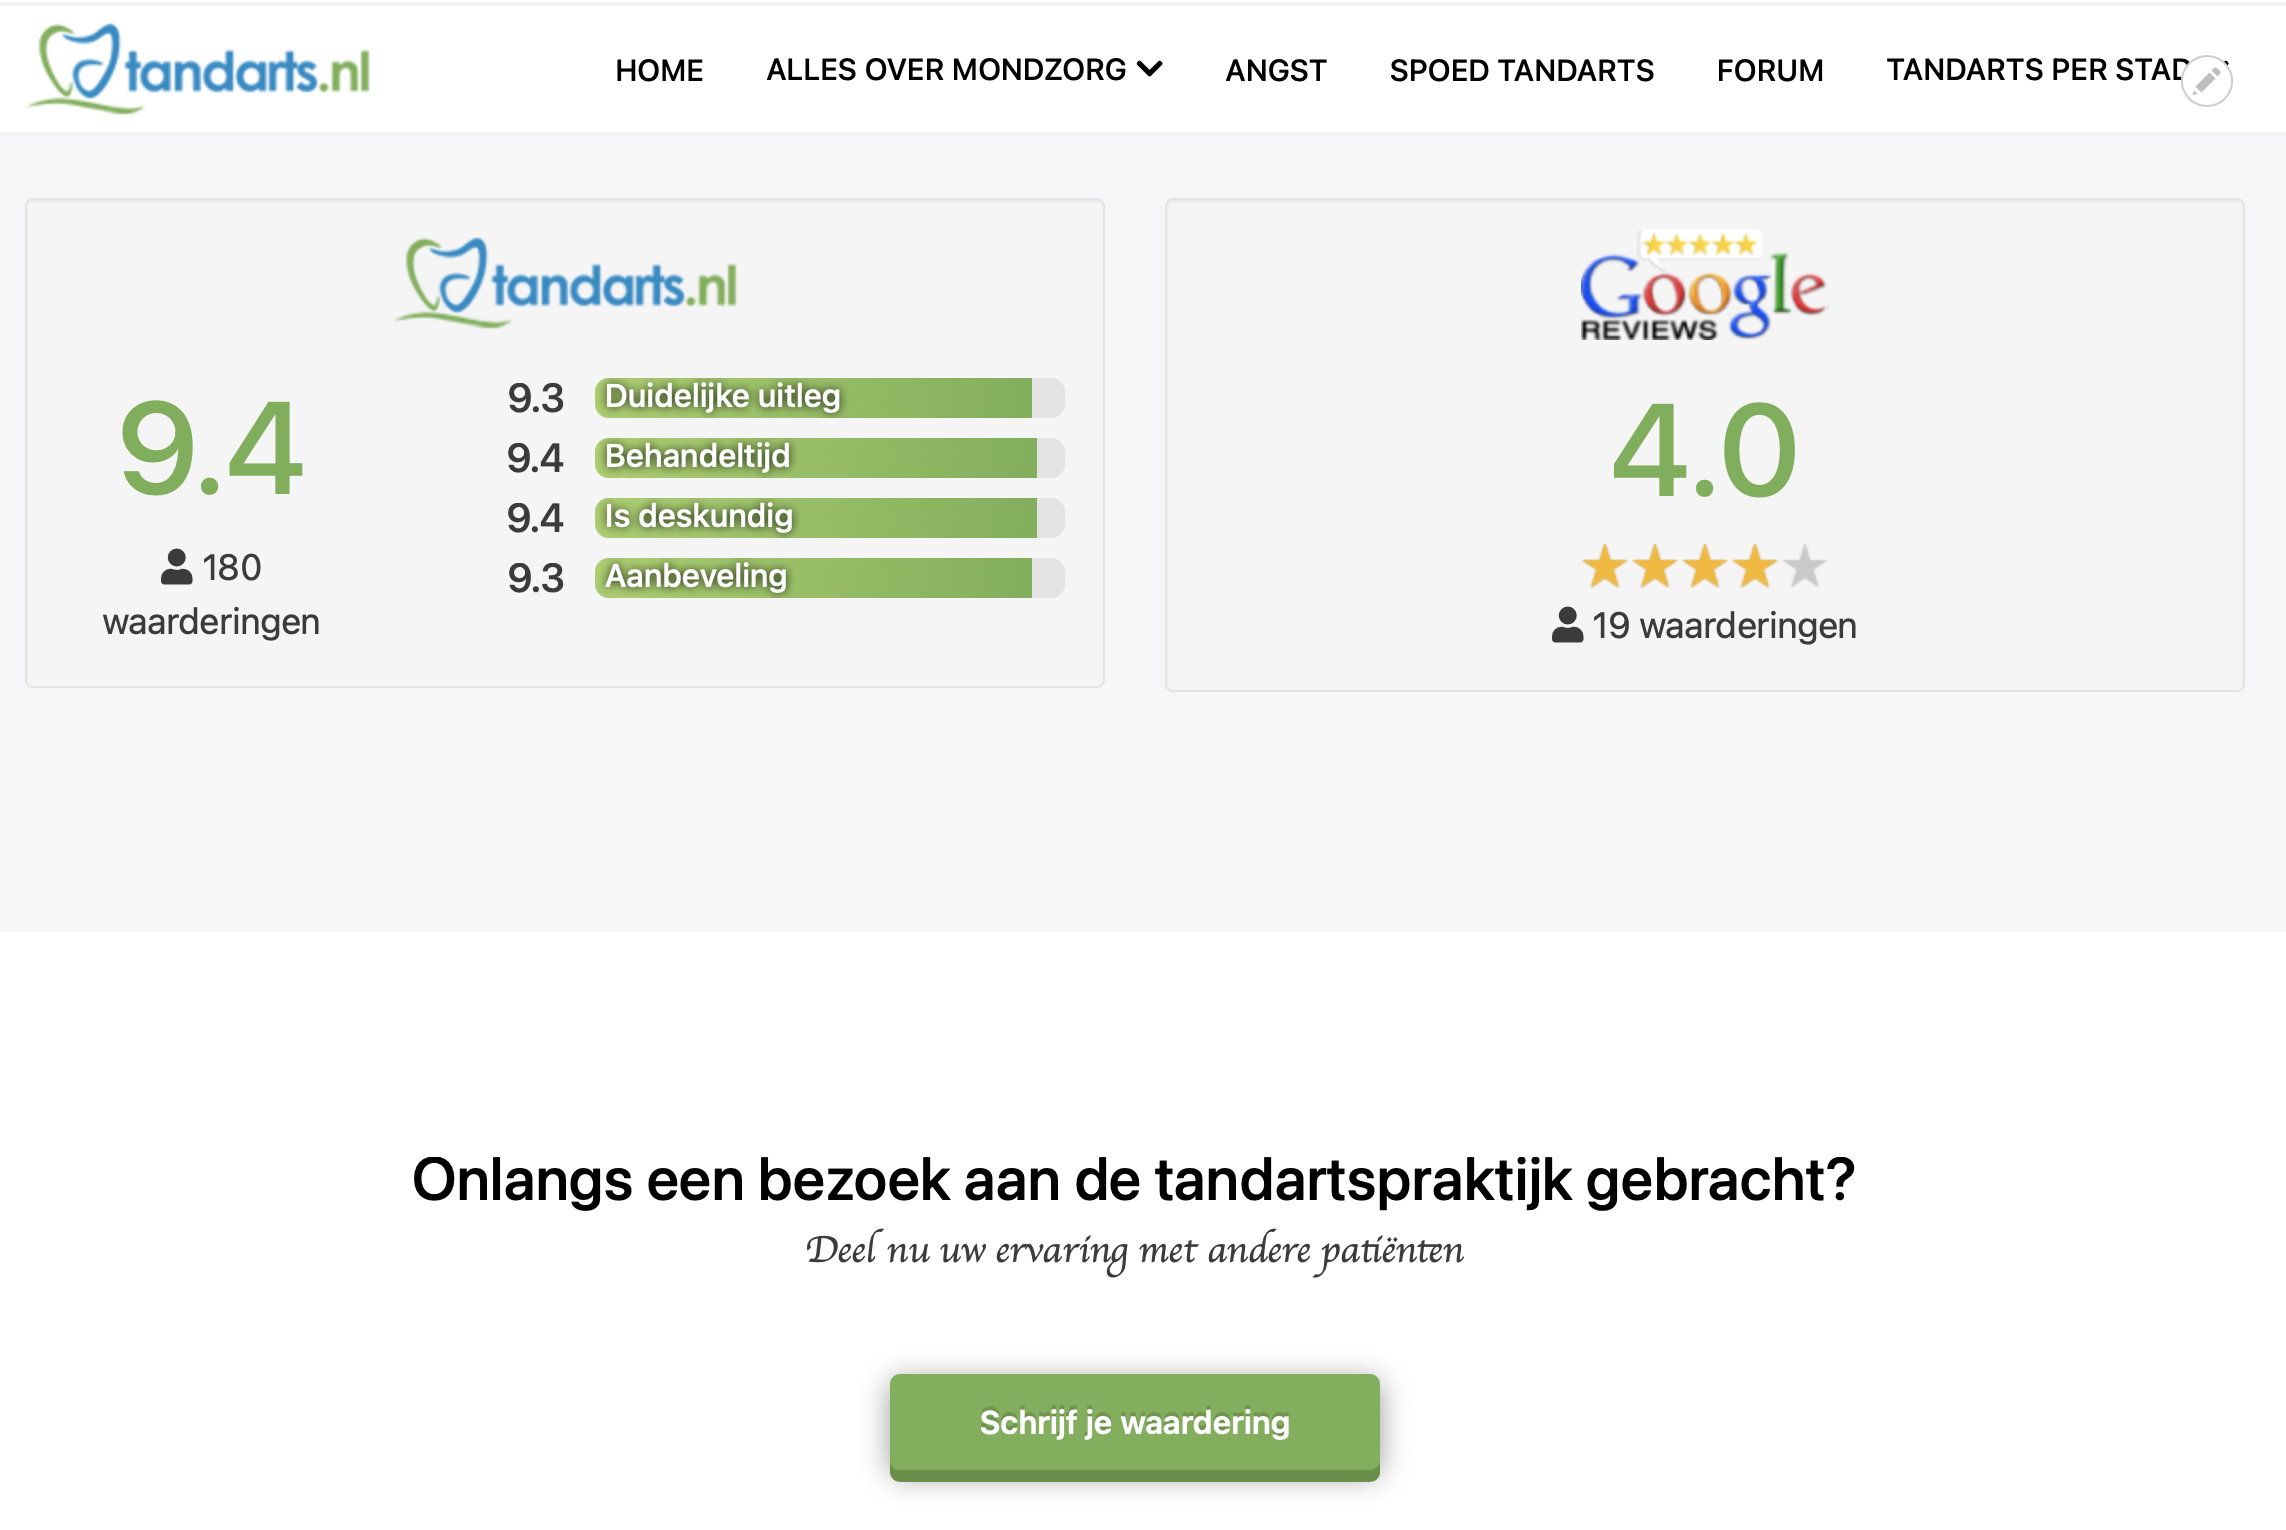 Weergave reviews van Google en Tandarts.nl